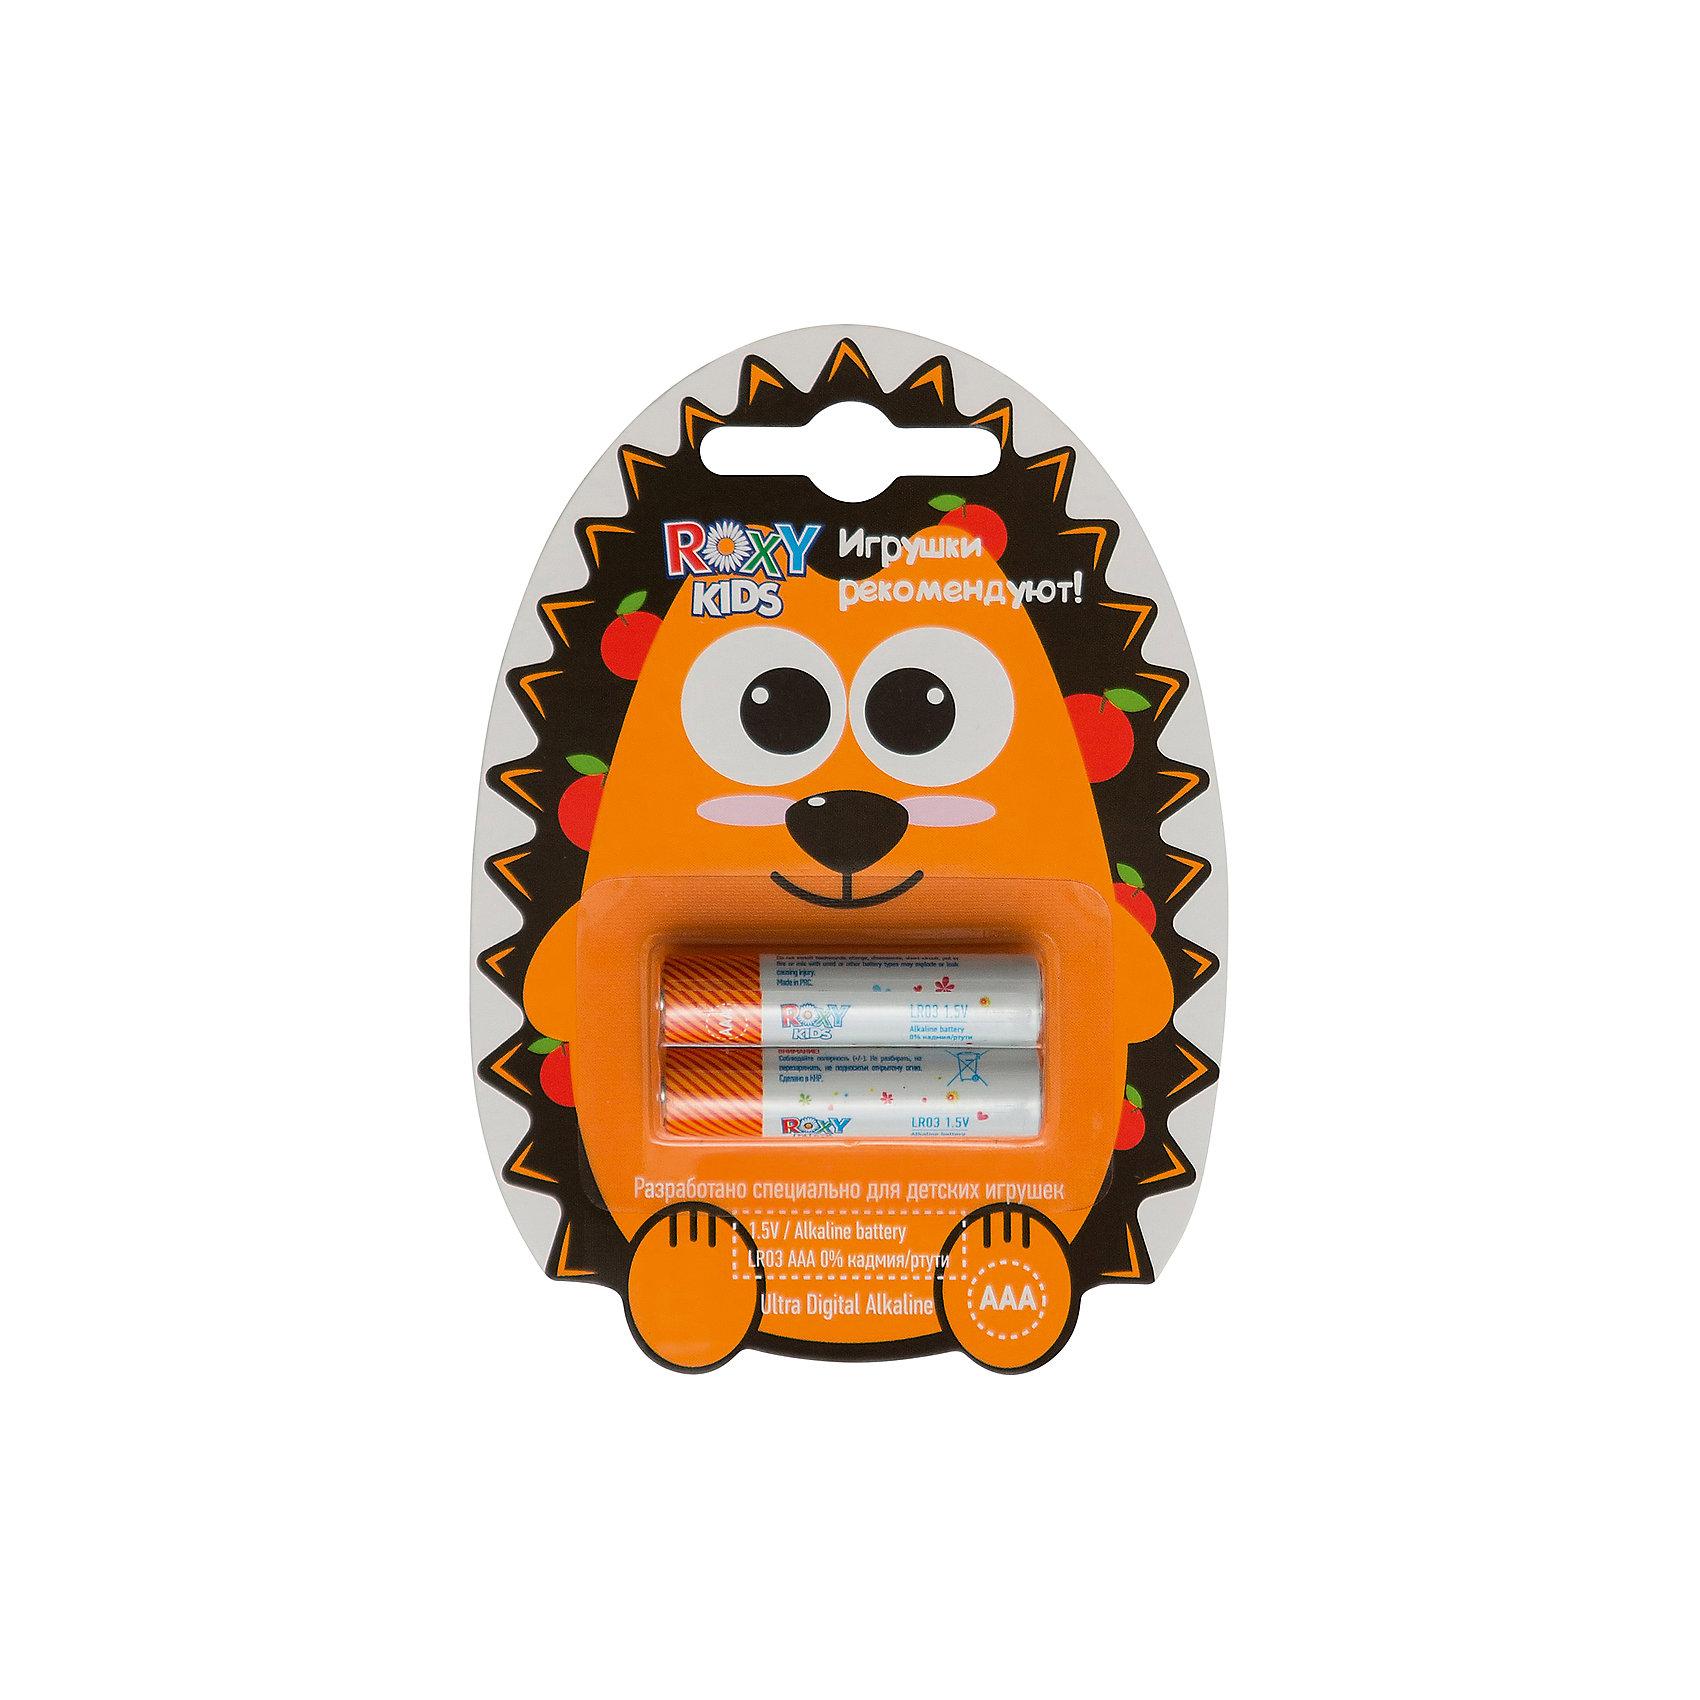 Roxy-Kids Батарейки для игрушек, тип ААА, 2 шт., Roxy-kids батарейки samsung pleomax aaa 2 шт